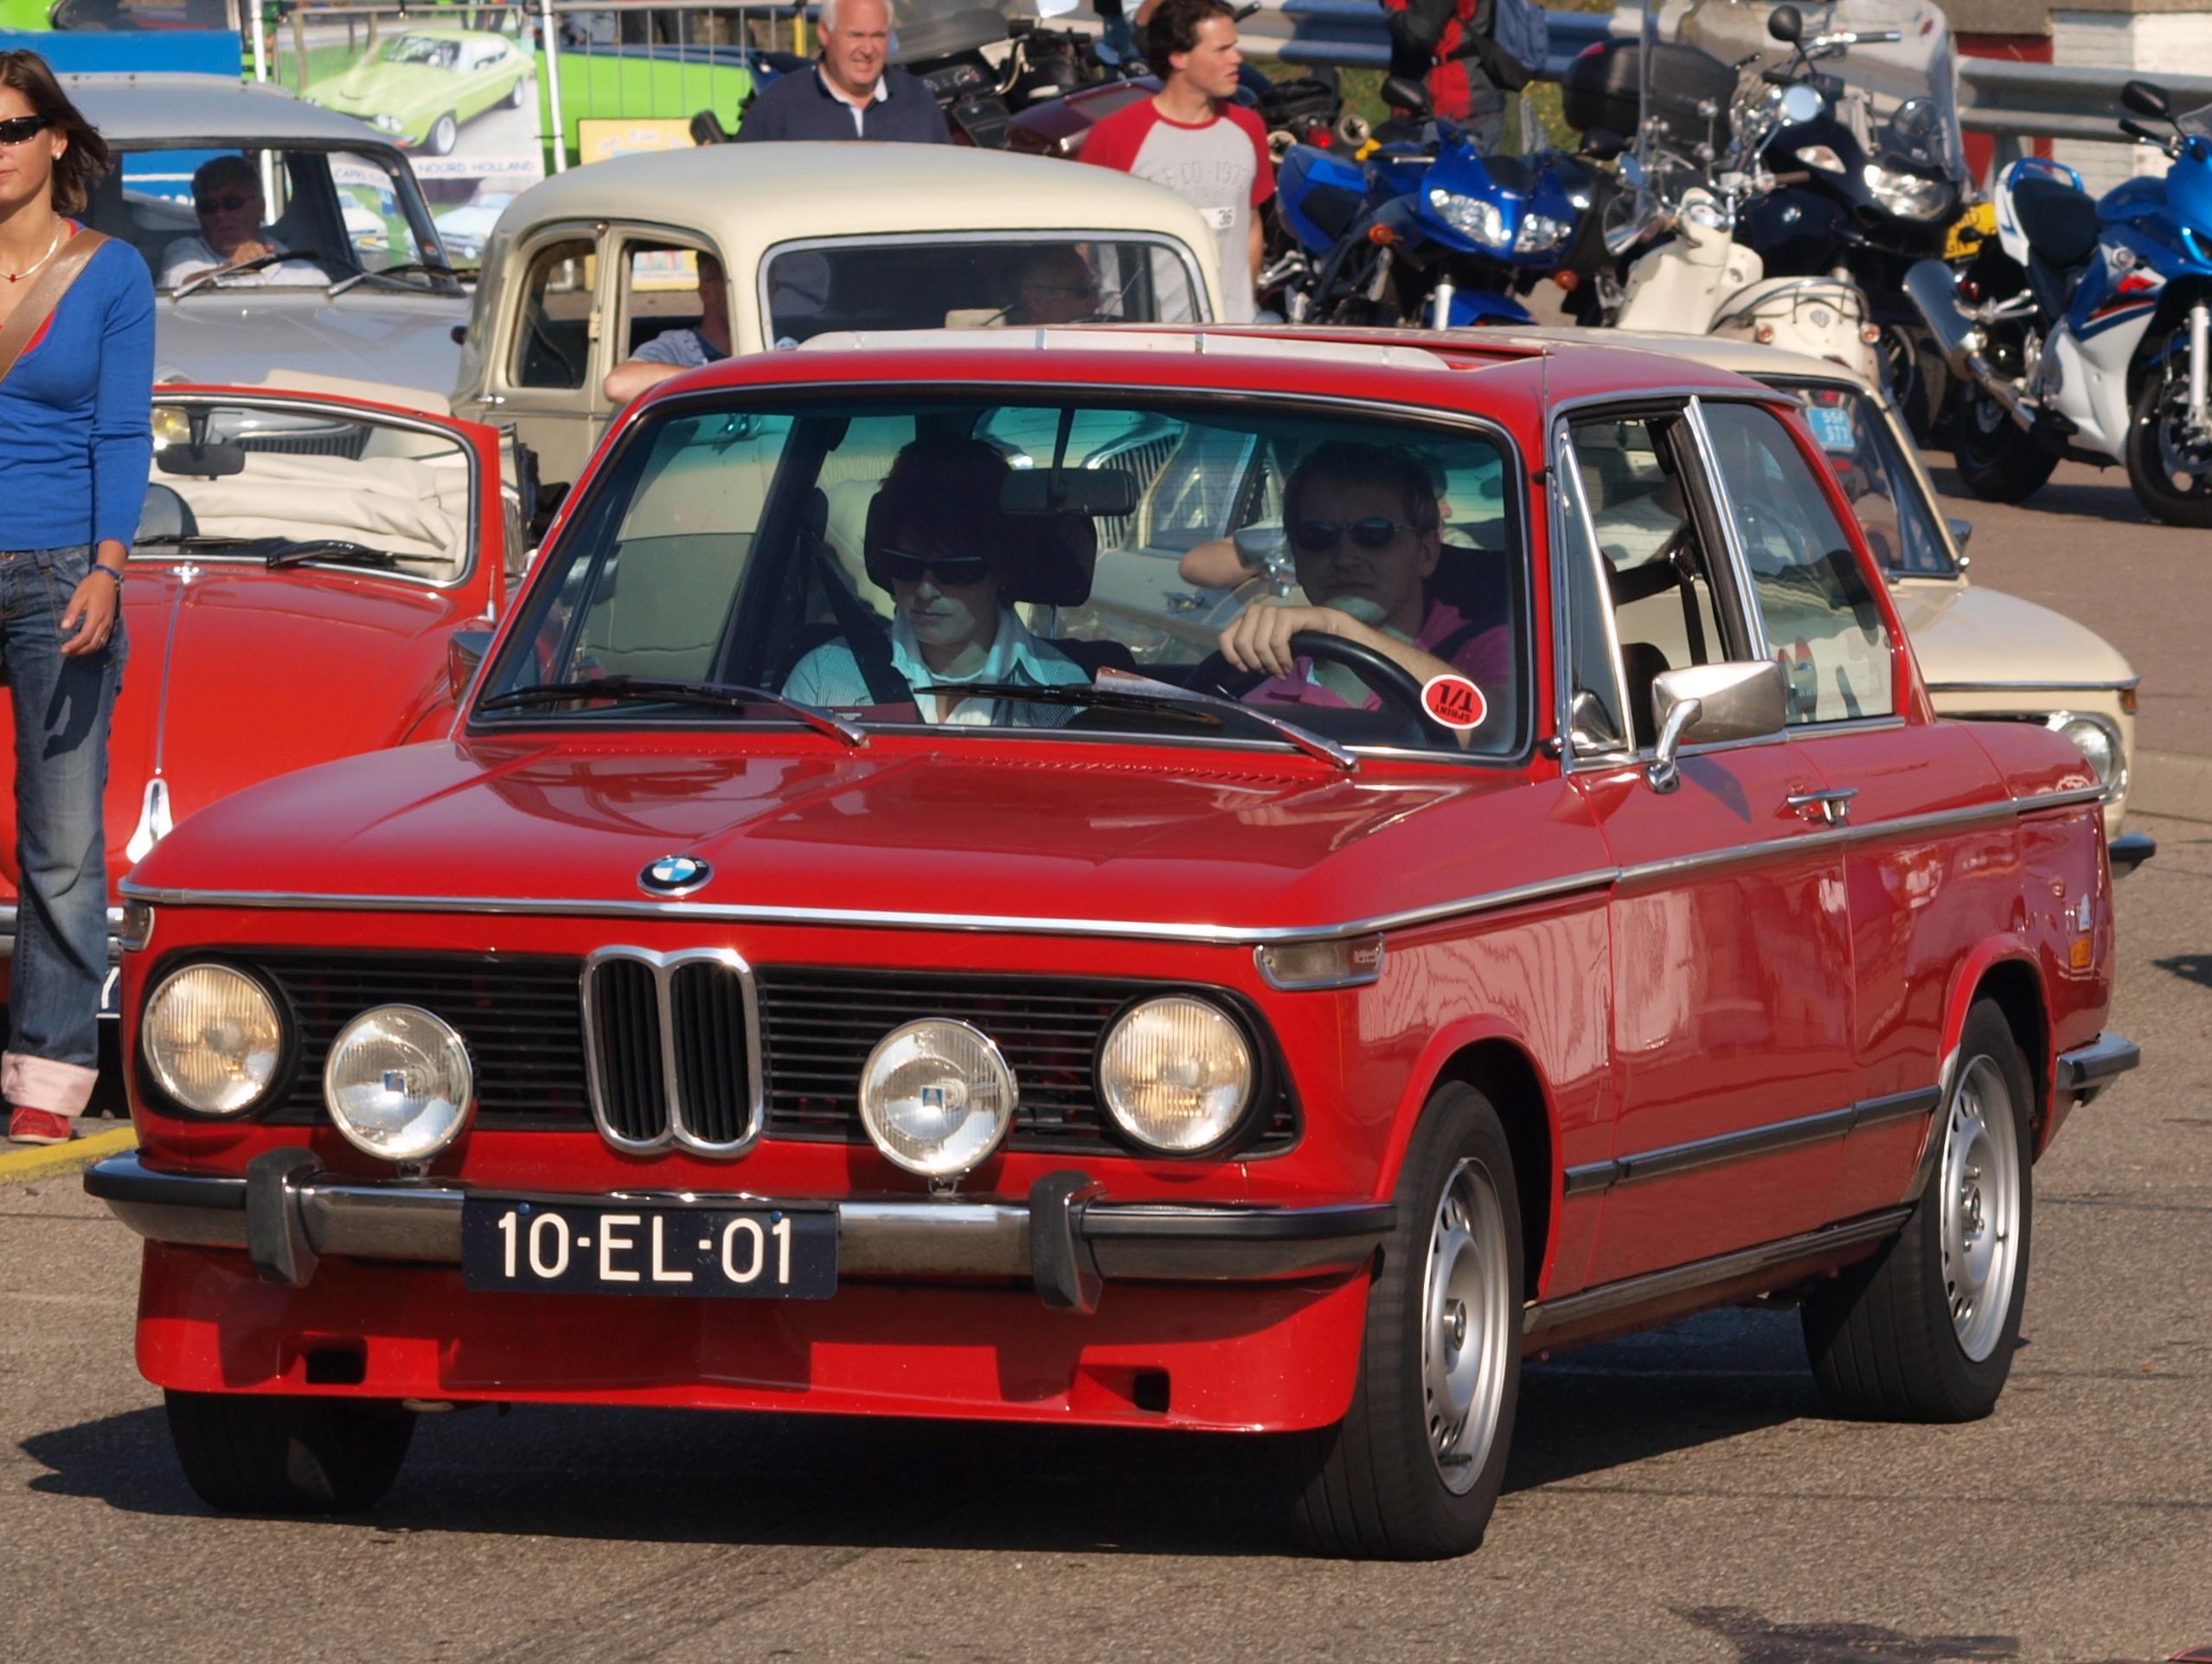 2018 - [BMW] Série 1 III [F40-F41] - Page 21 BMW_2002_TII_dutch_licence_registration_10-EL-01_pic4